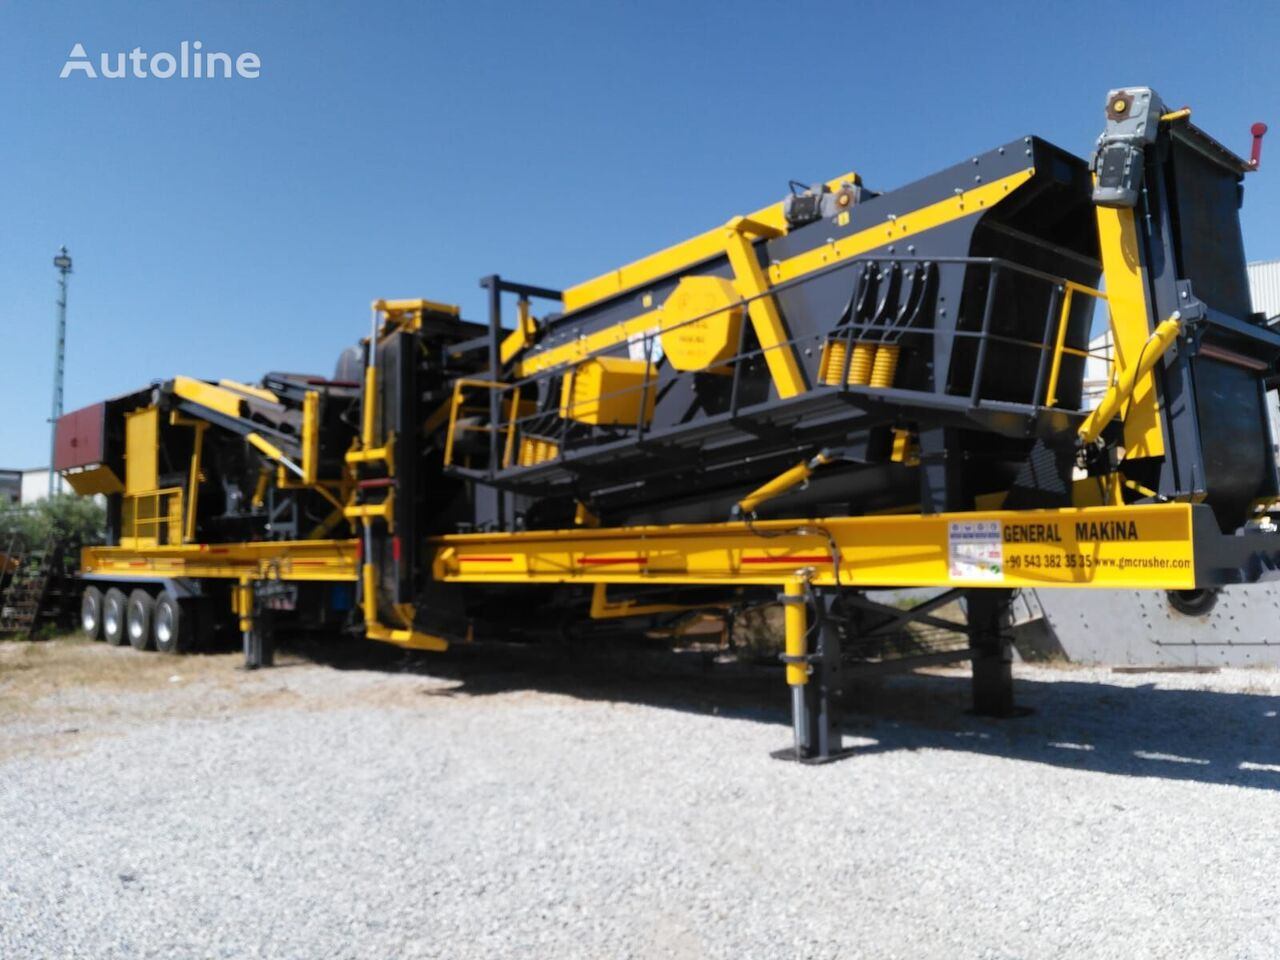 new GENERAL MAKİNA General 02/Rotornaya 1250h1400 mobile crushing plant